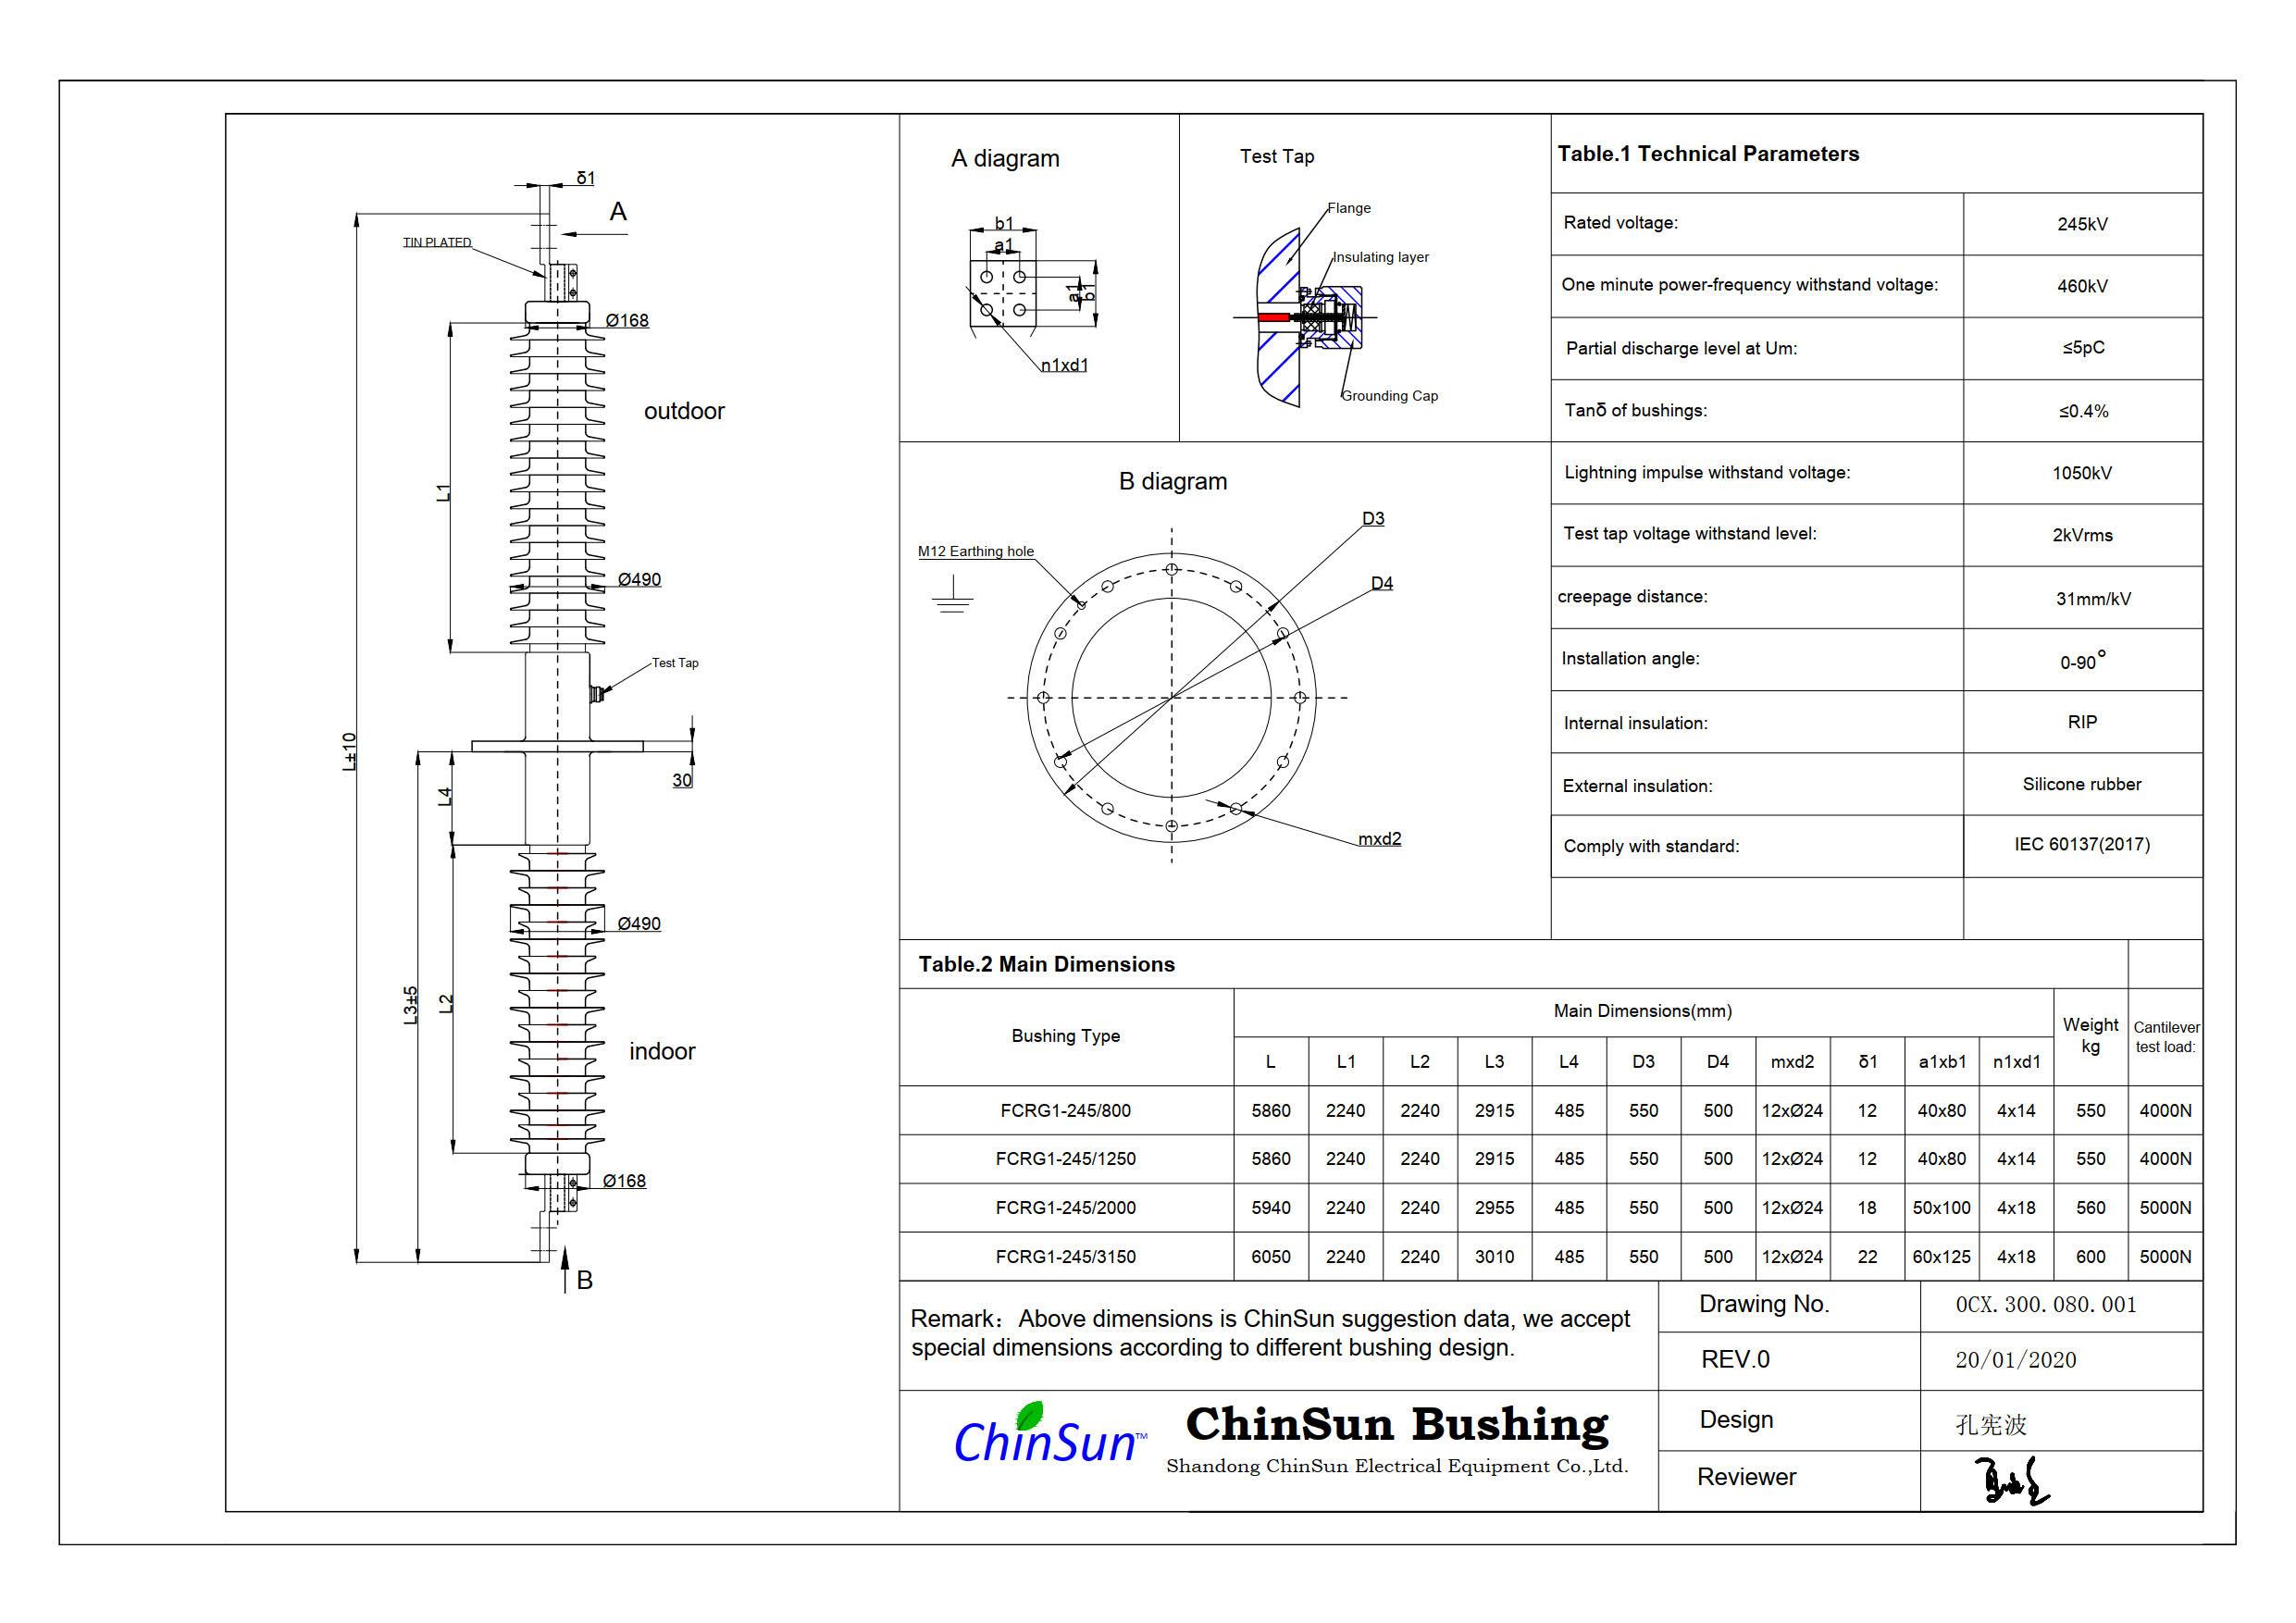 Drawing-wall bushing-245kV silicone rubber-ChinSun